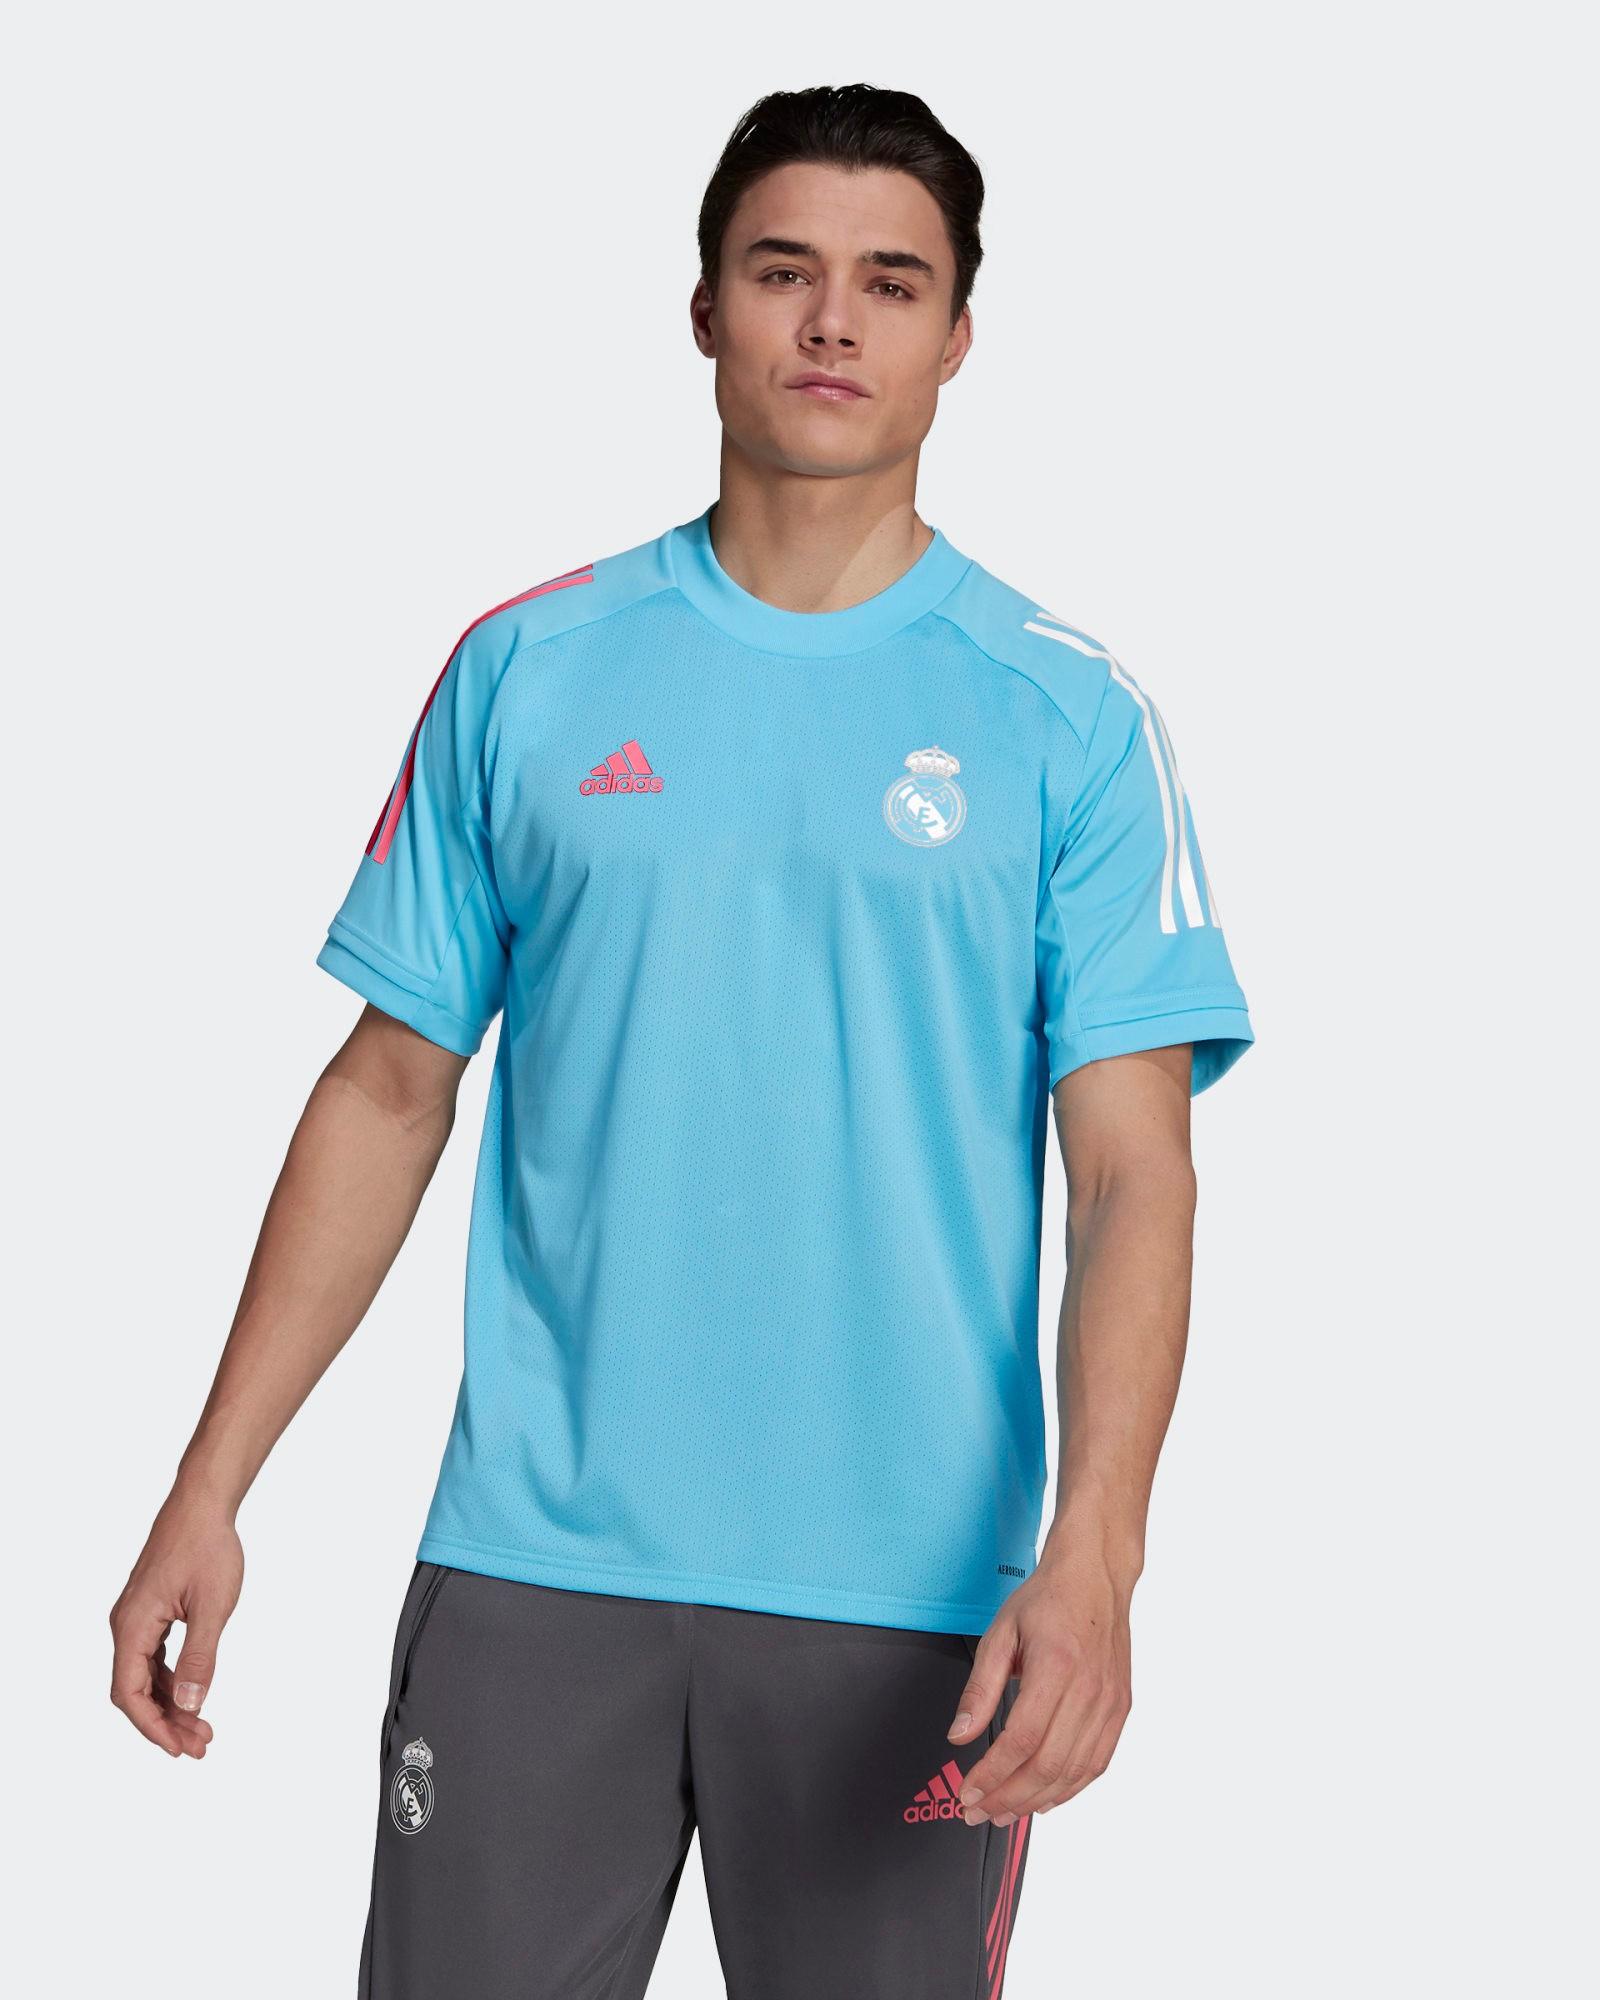 Real Madrid Adidas Maglia Allenamento Training UOMO Celeste AEROREADY 2021 0